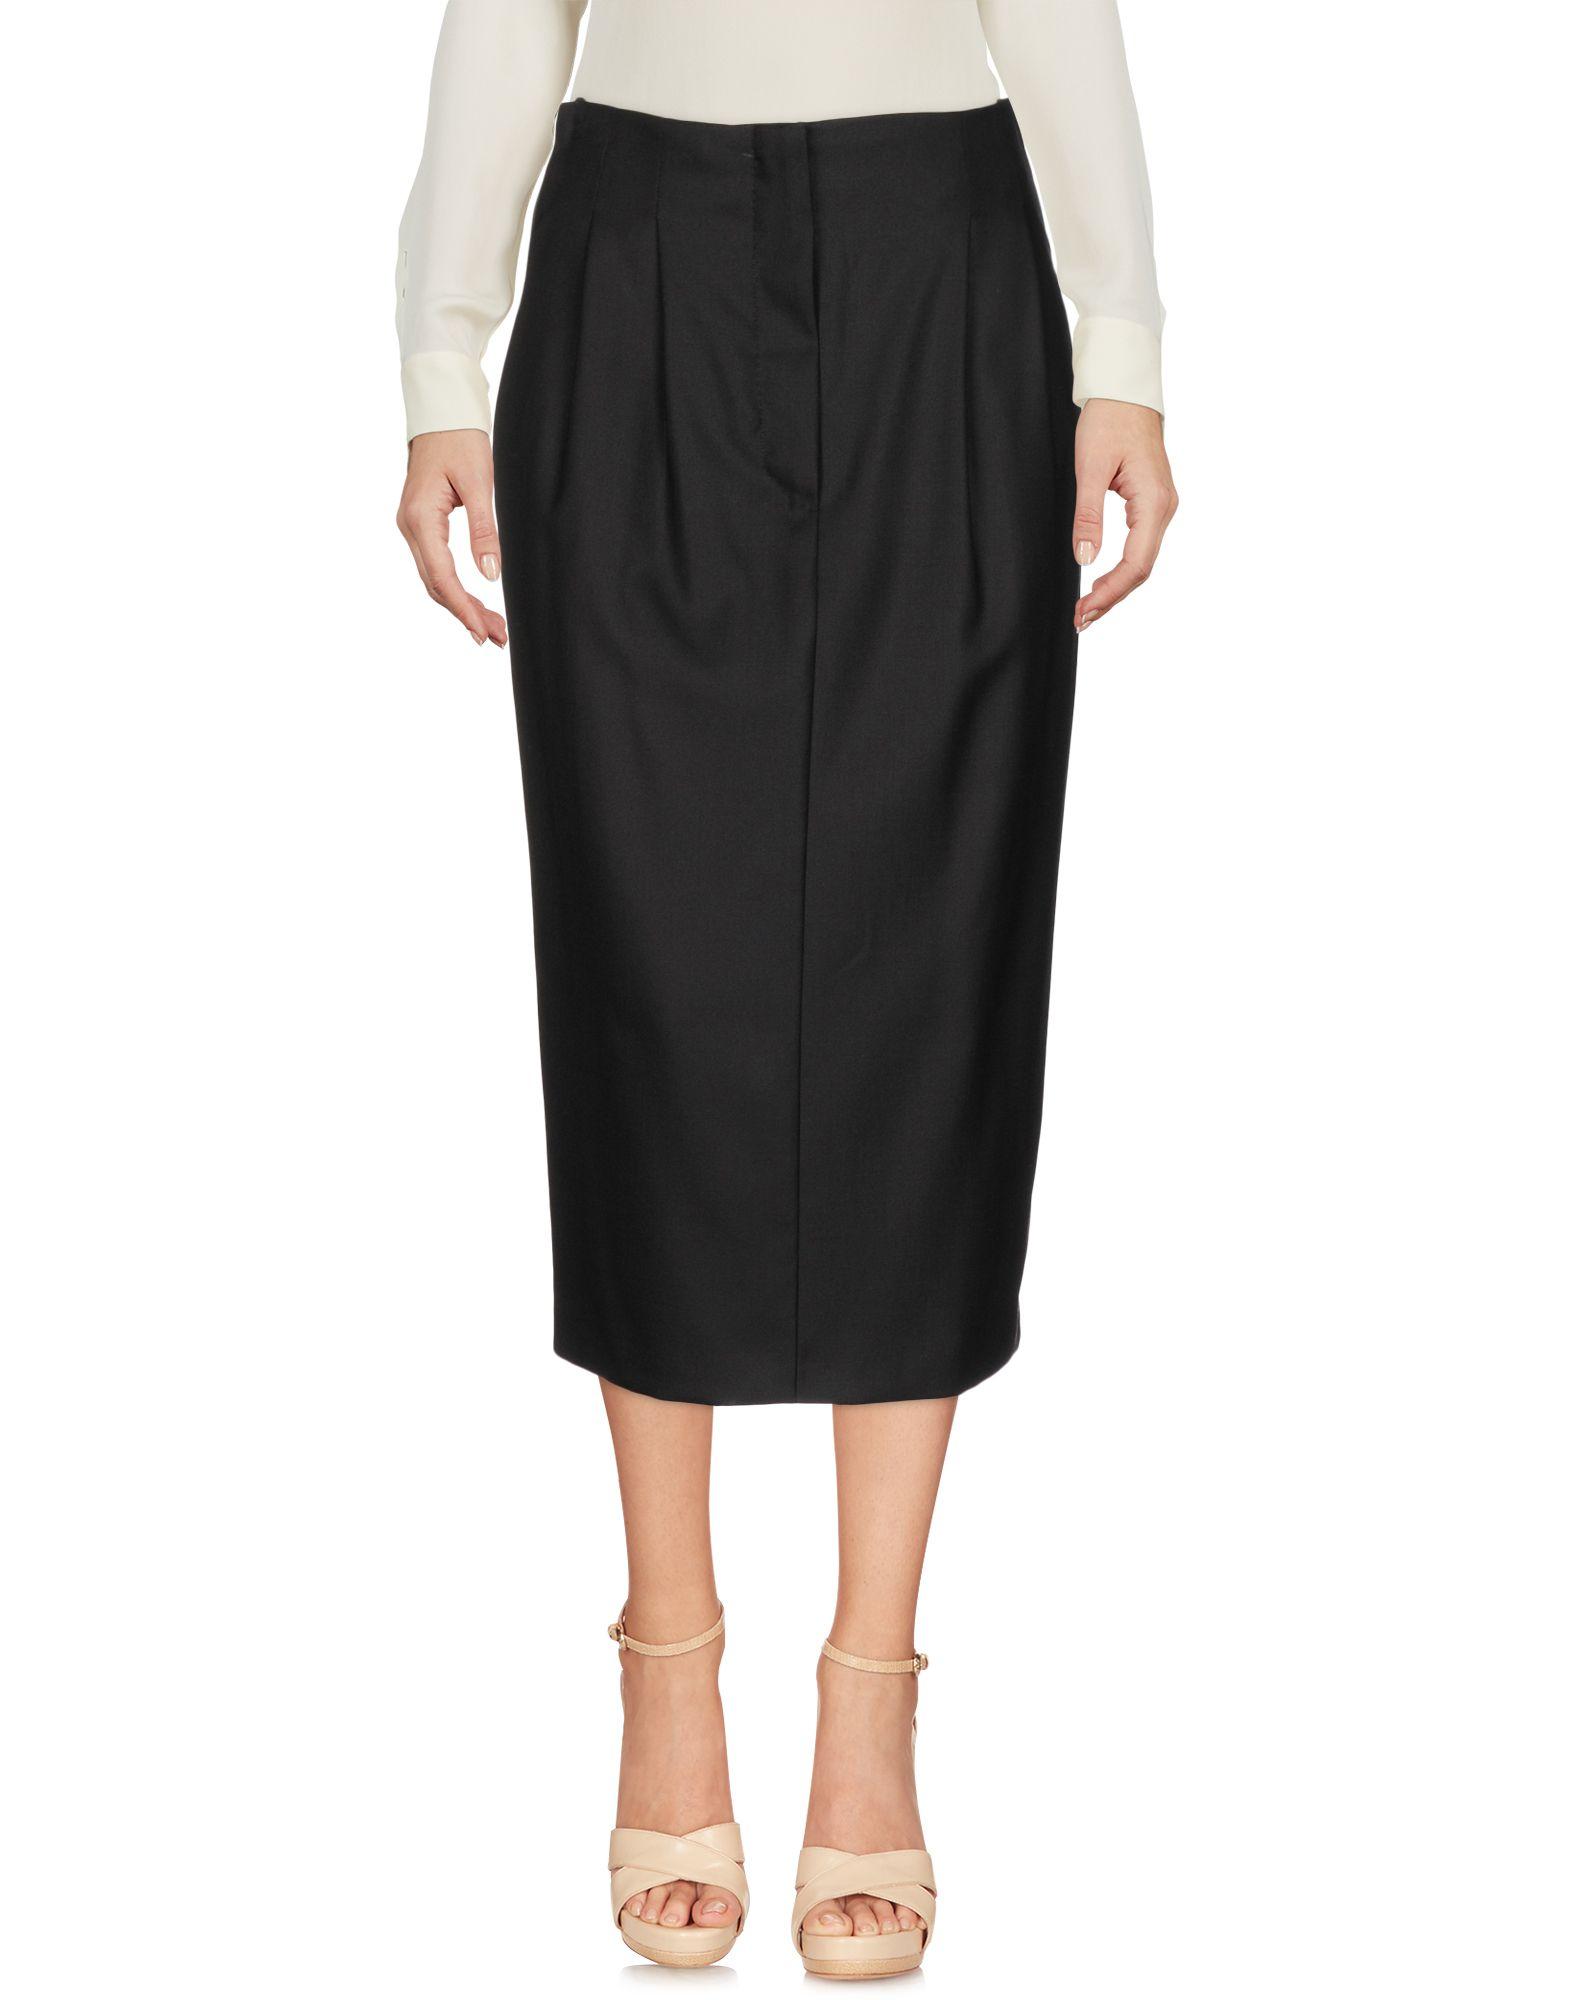 MAX MARA Юбка длиной 3/4 юбка max mara юбка